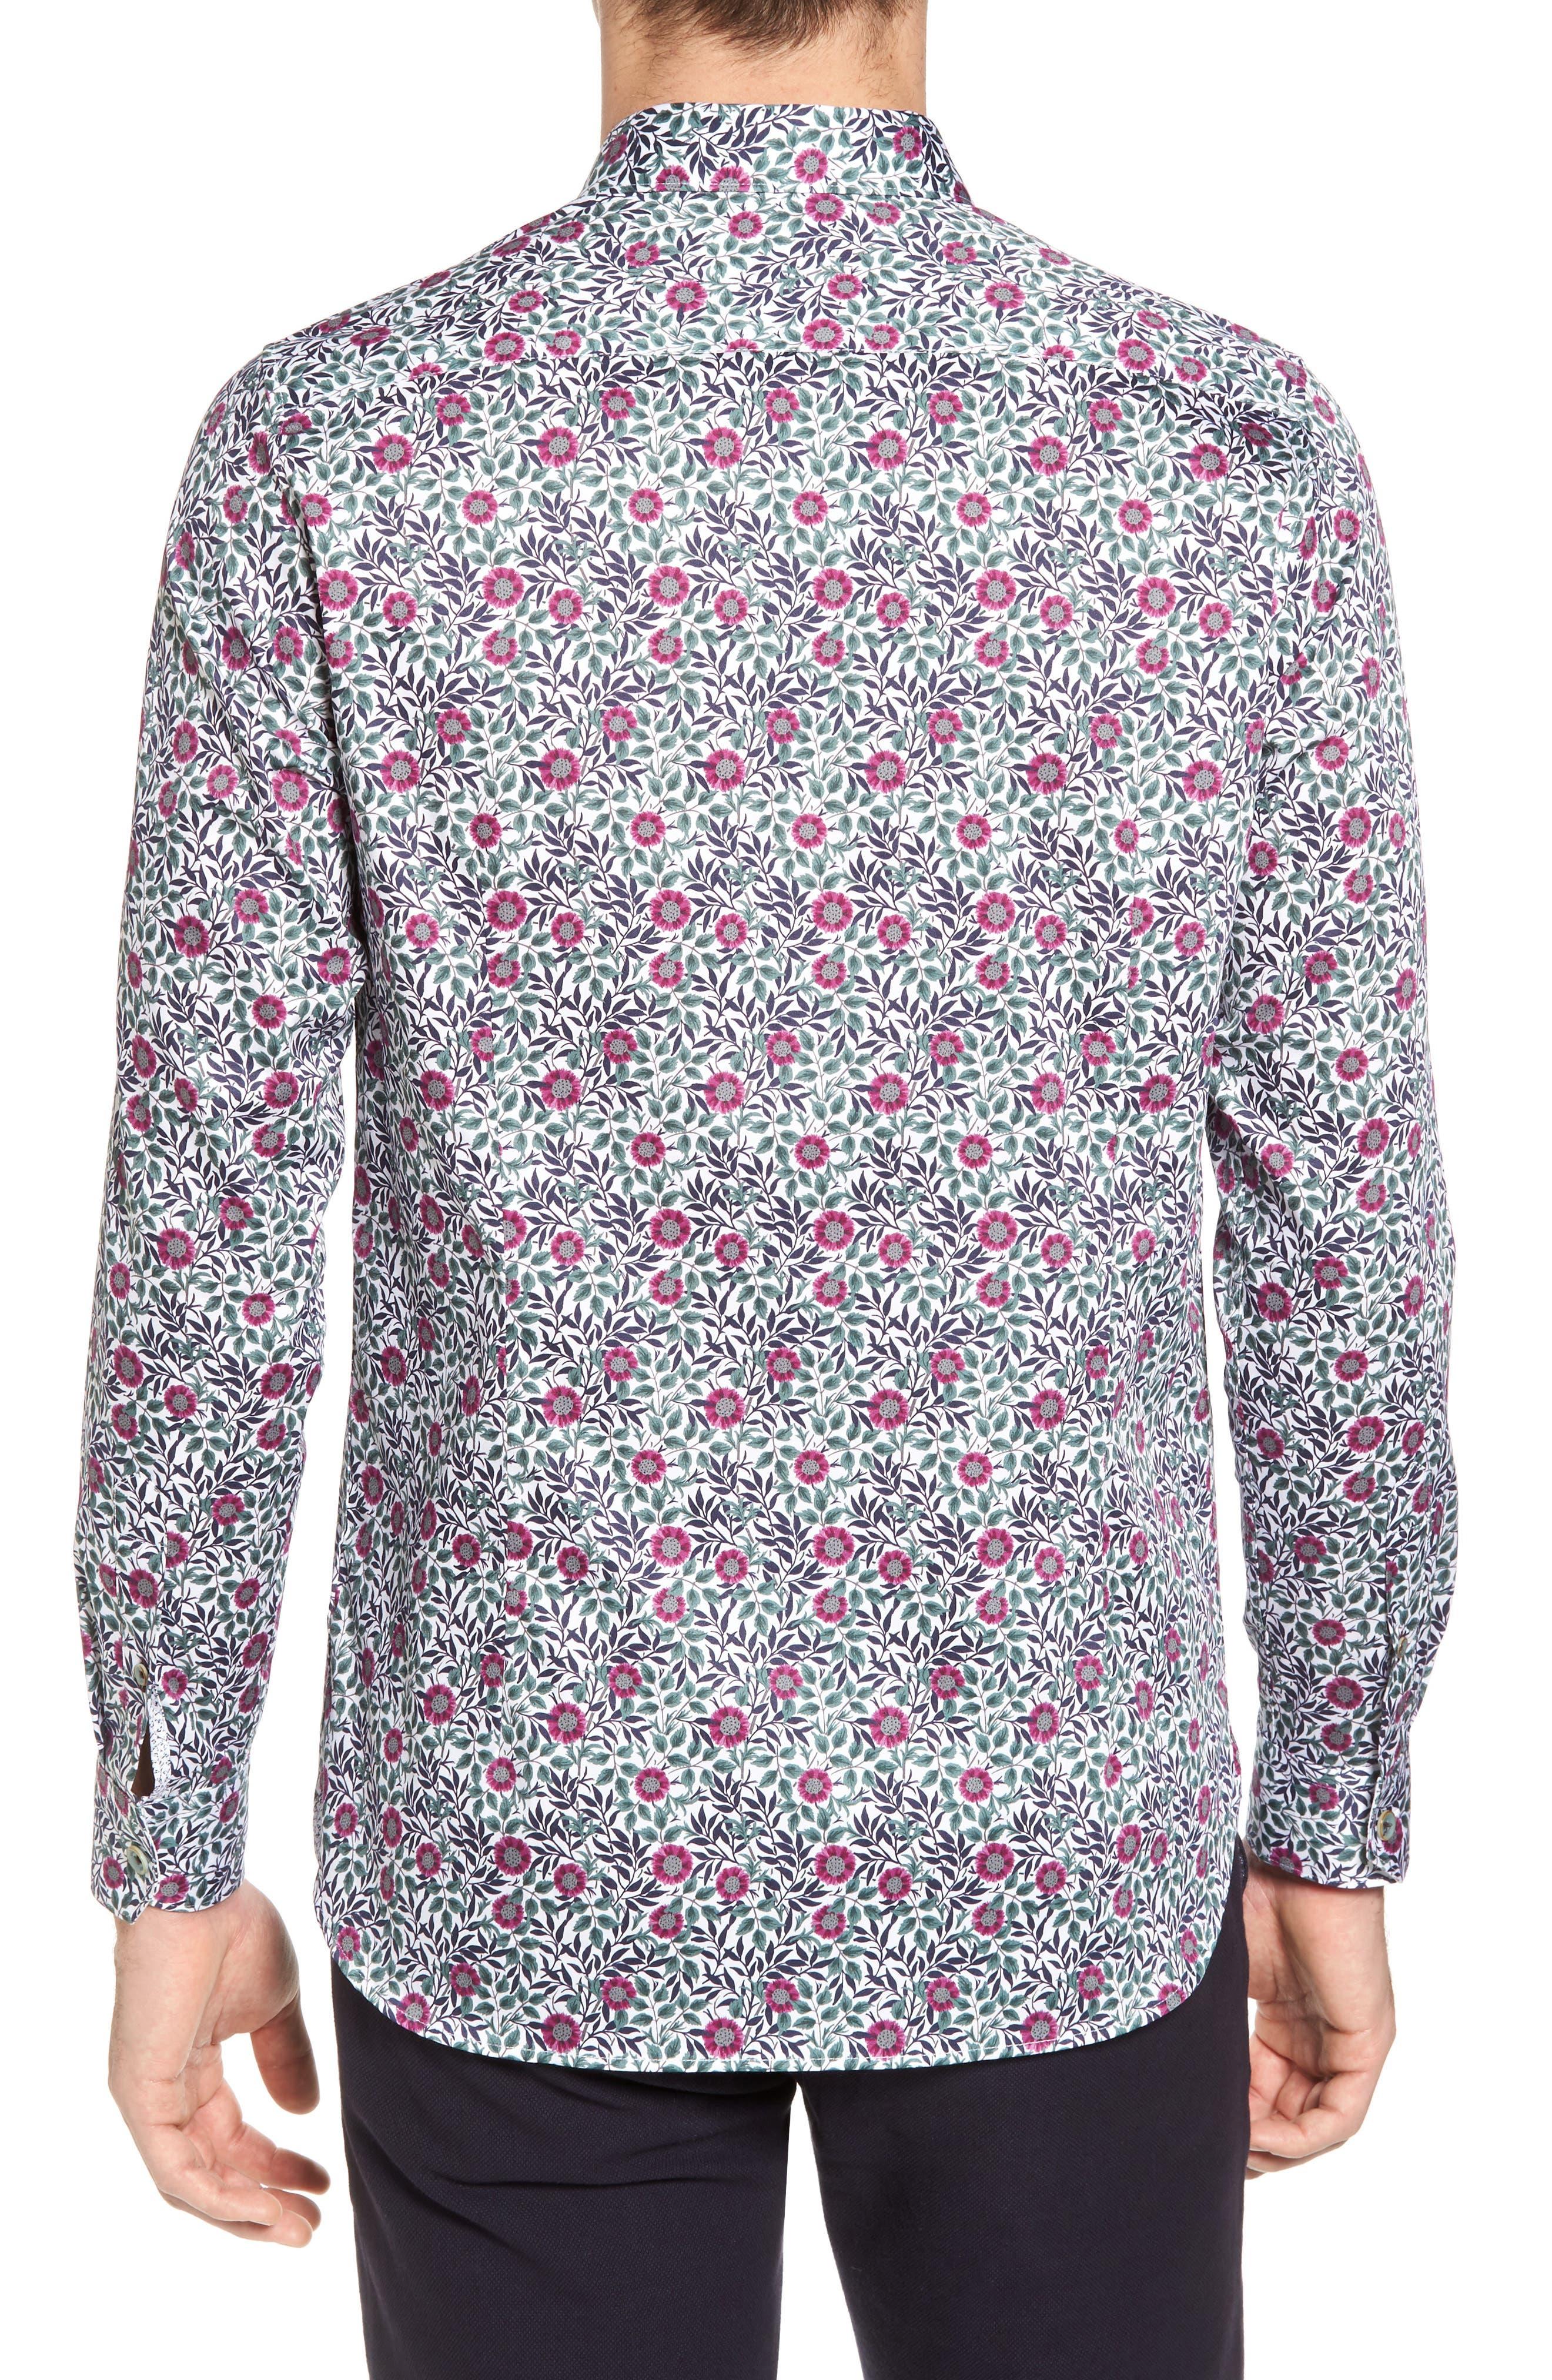 Orense Floral Print Slim Fit Shirt,                             Alternate thumbnail 3, color,                             Green